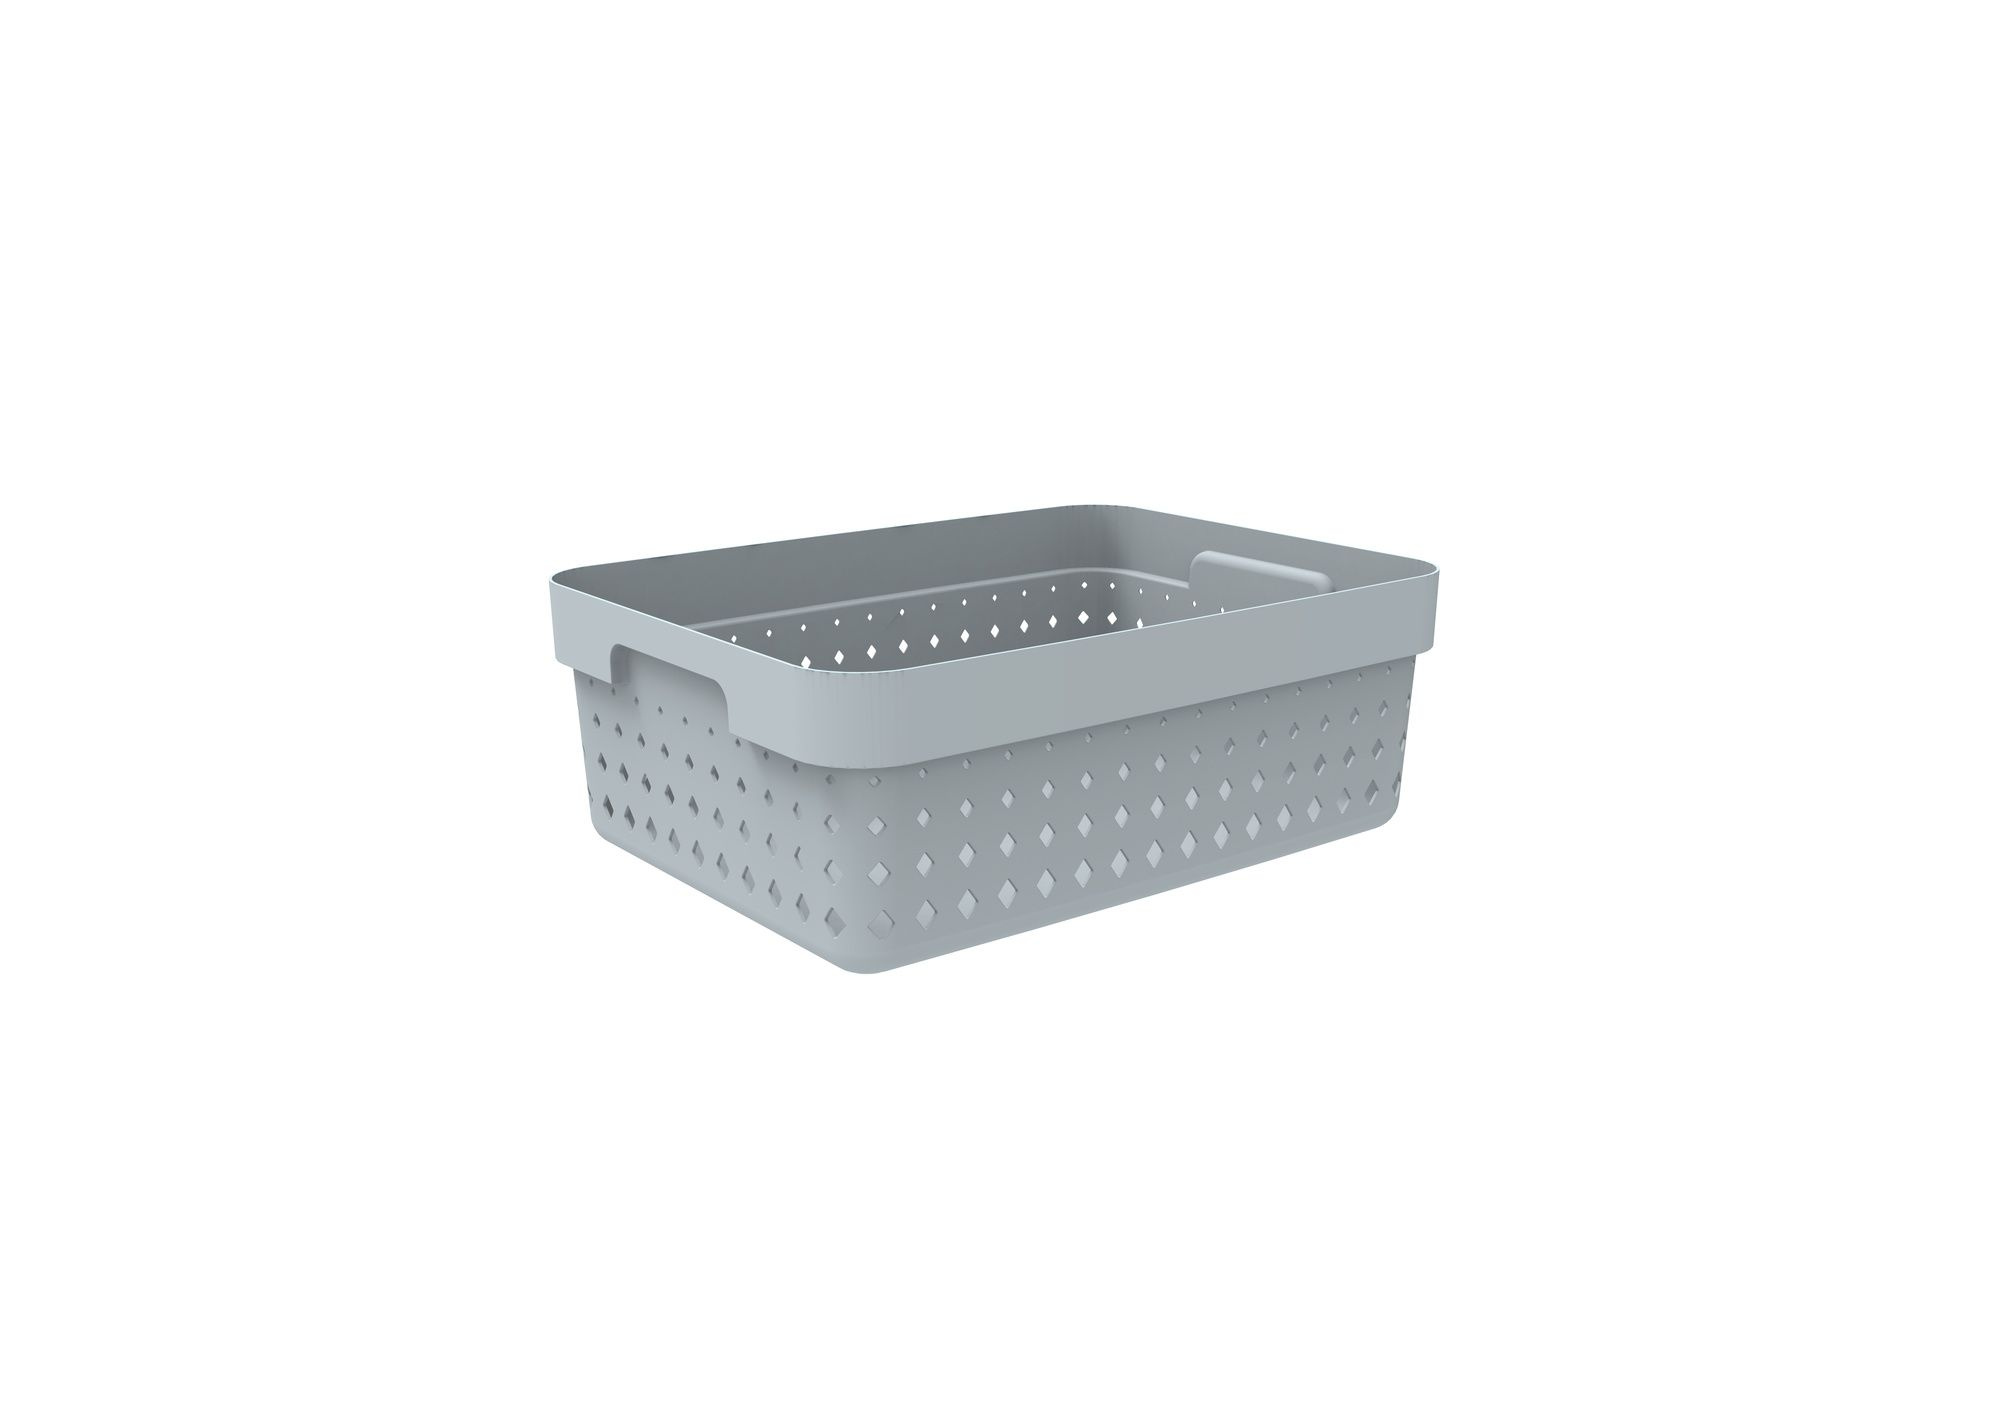 košík SEOUL M, 36x27x13cm-šedý, plast